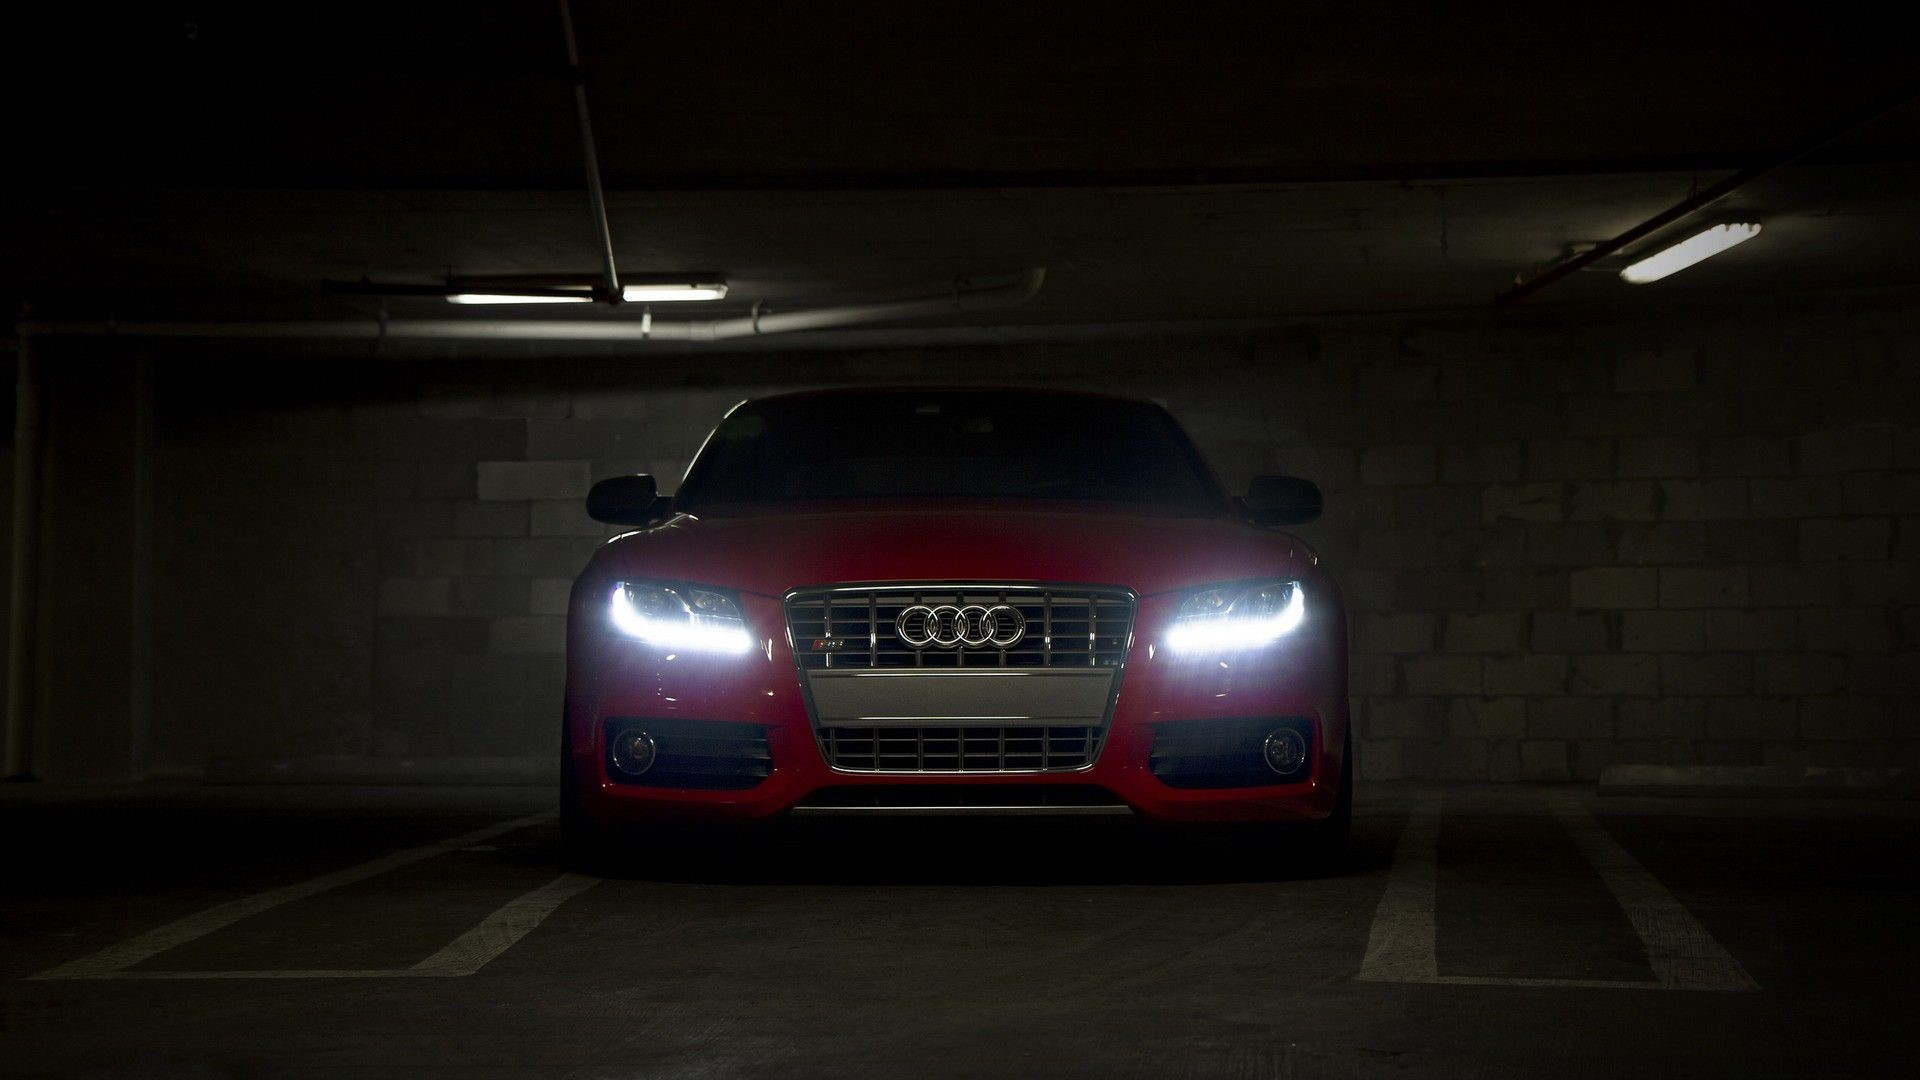 Audi A4 Windows Wallpapers